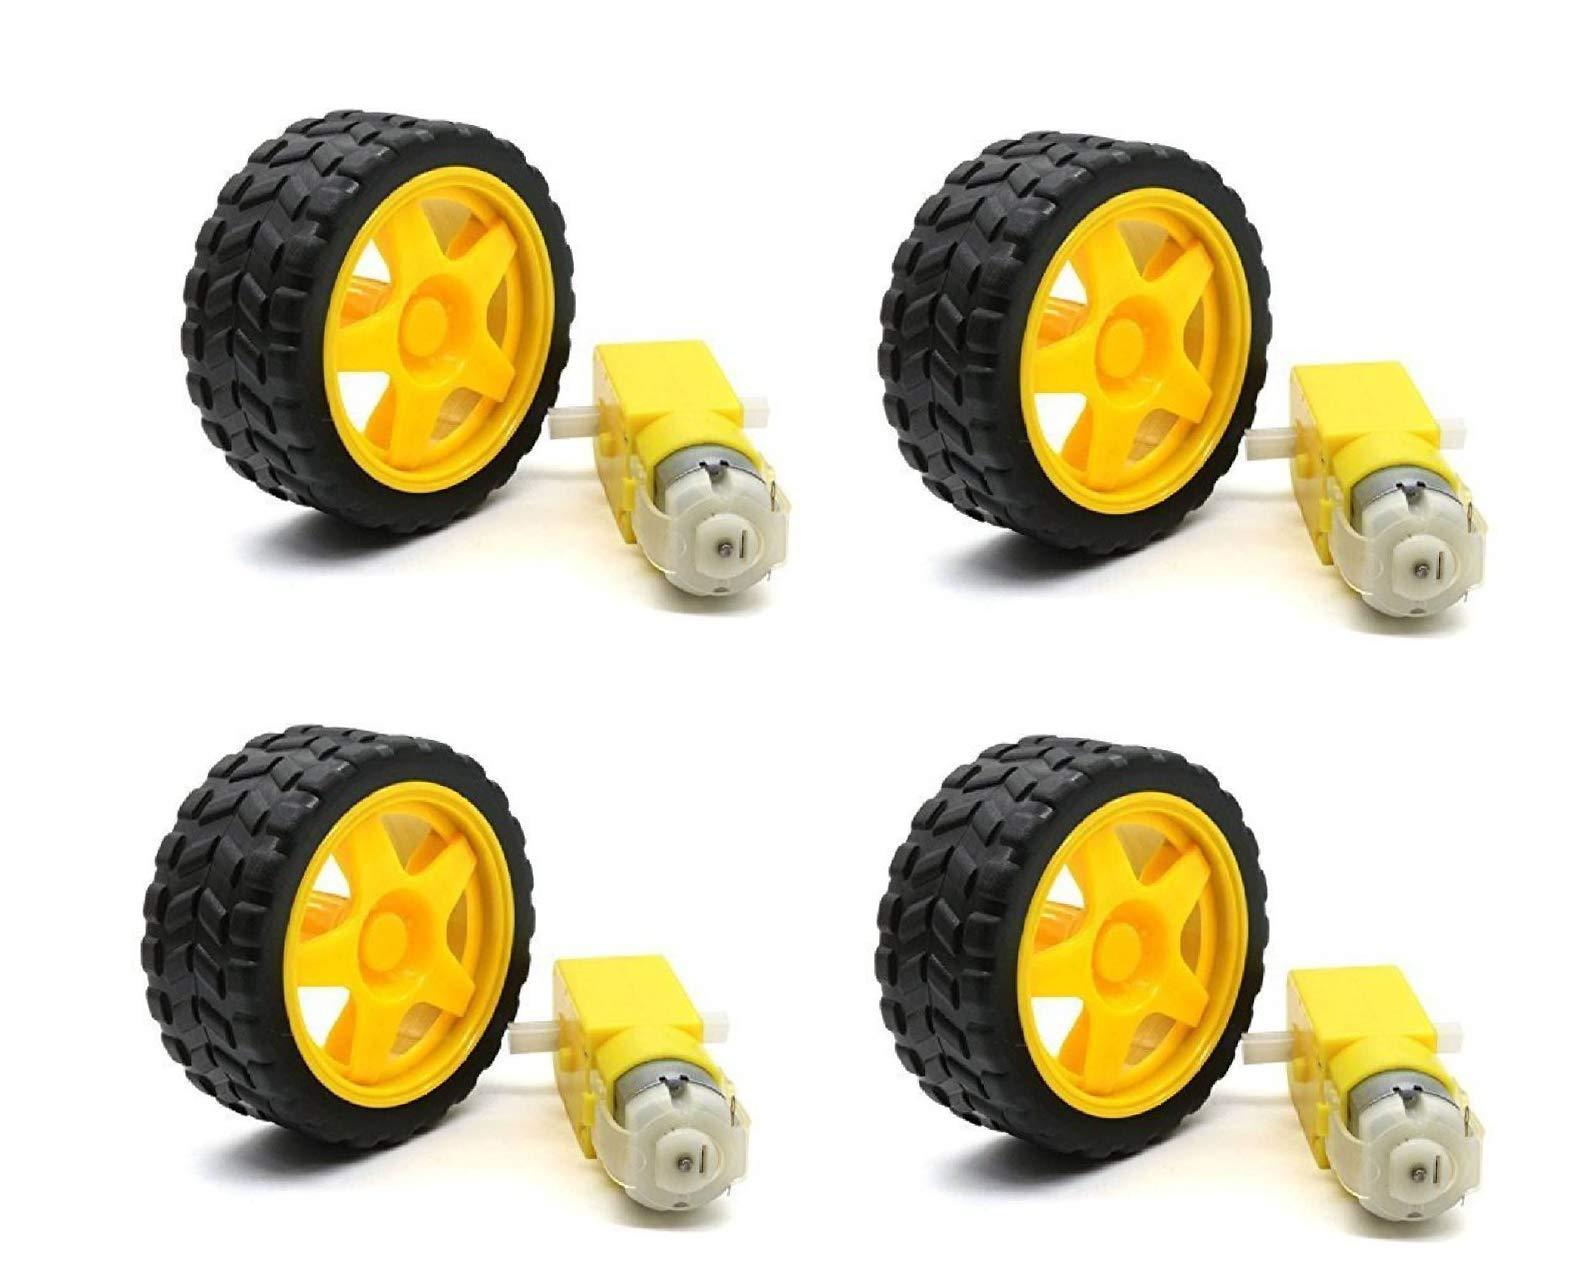 Robotbanao U4-H7PC-OABH Bo1 Duel Shaft Bo Motor 150 Rpm With Wheel, Black and Yellow